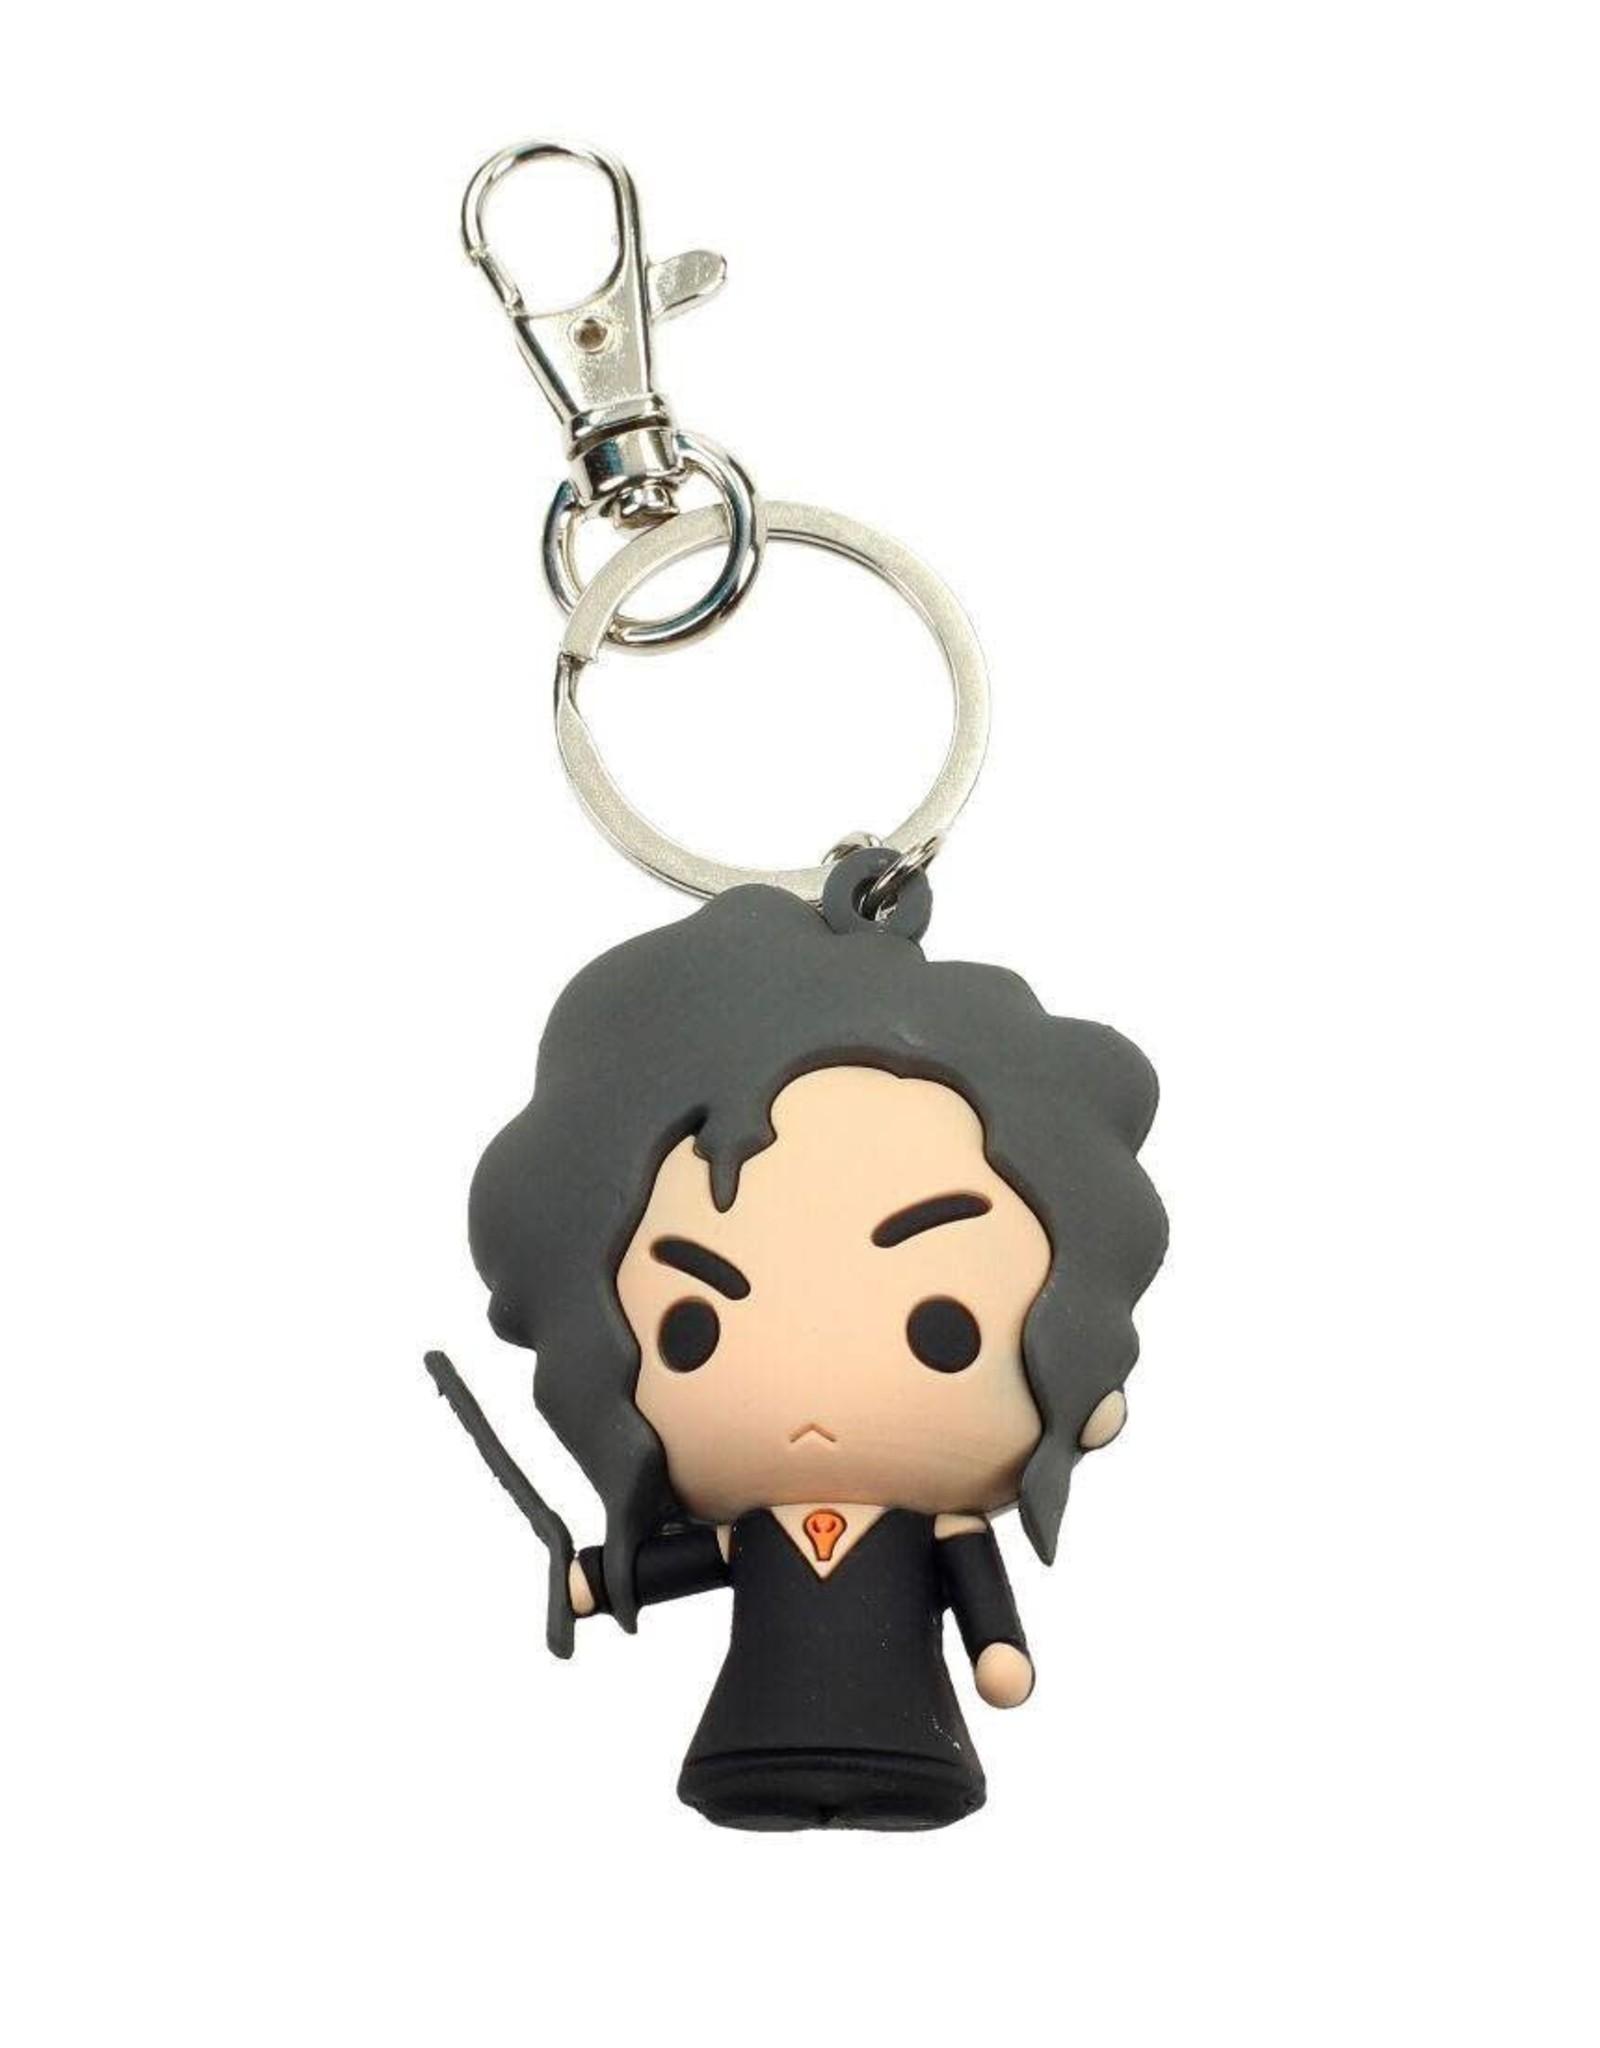 HARRY POTTER - Rubber Figure Keychain - Bellatrix Lestrange